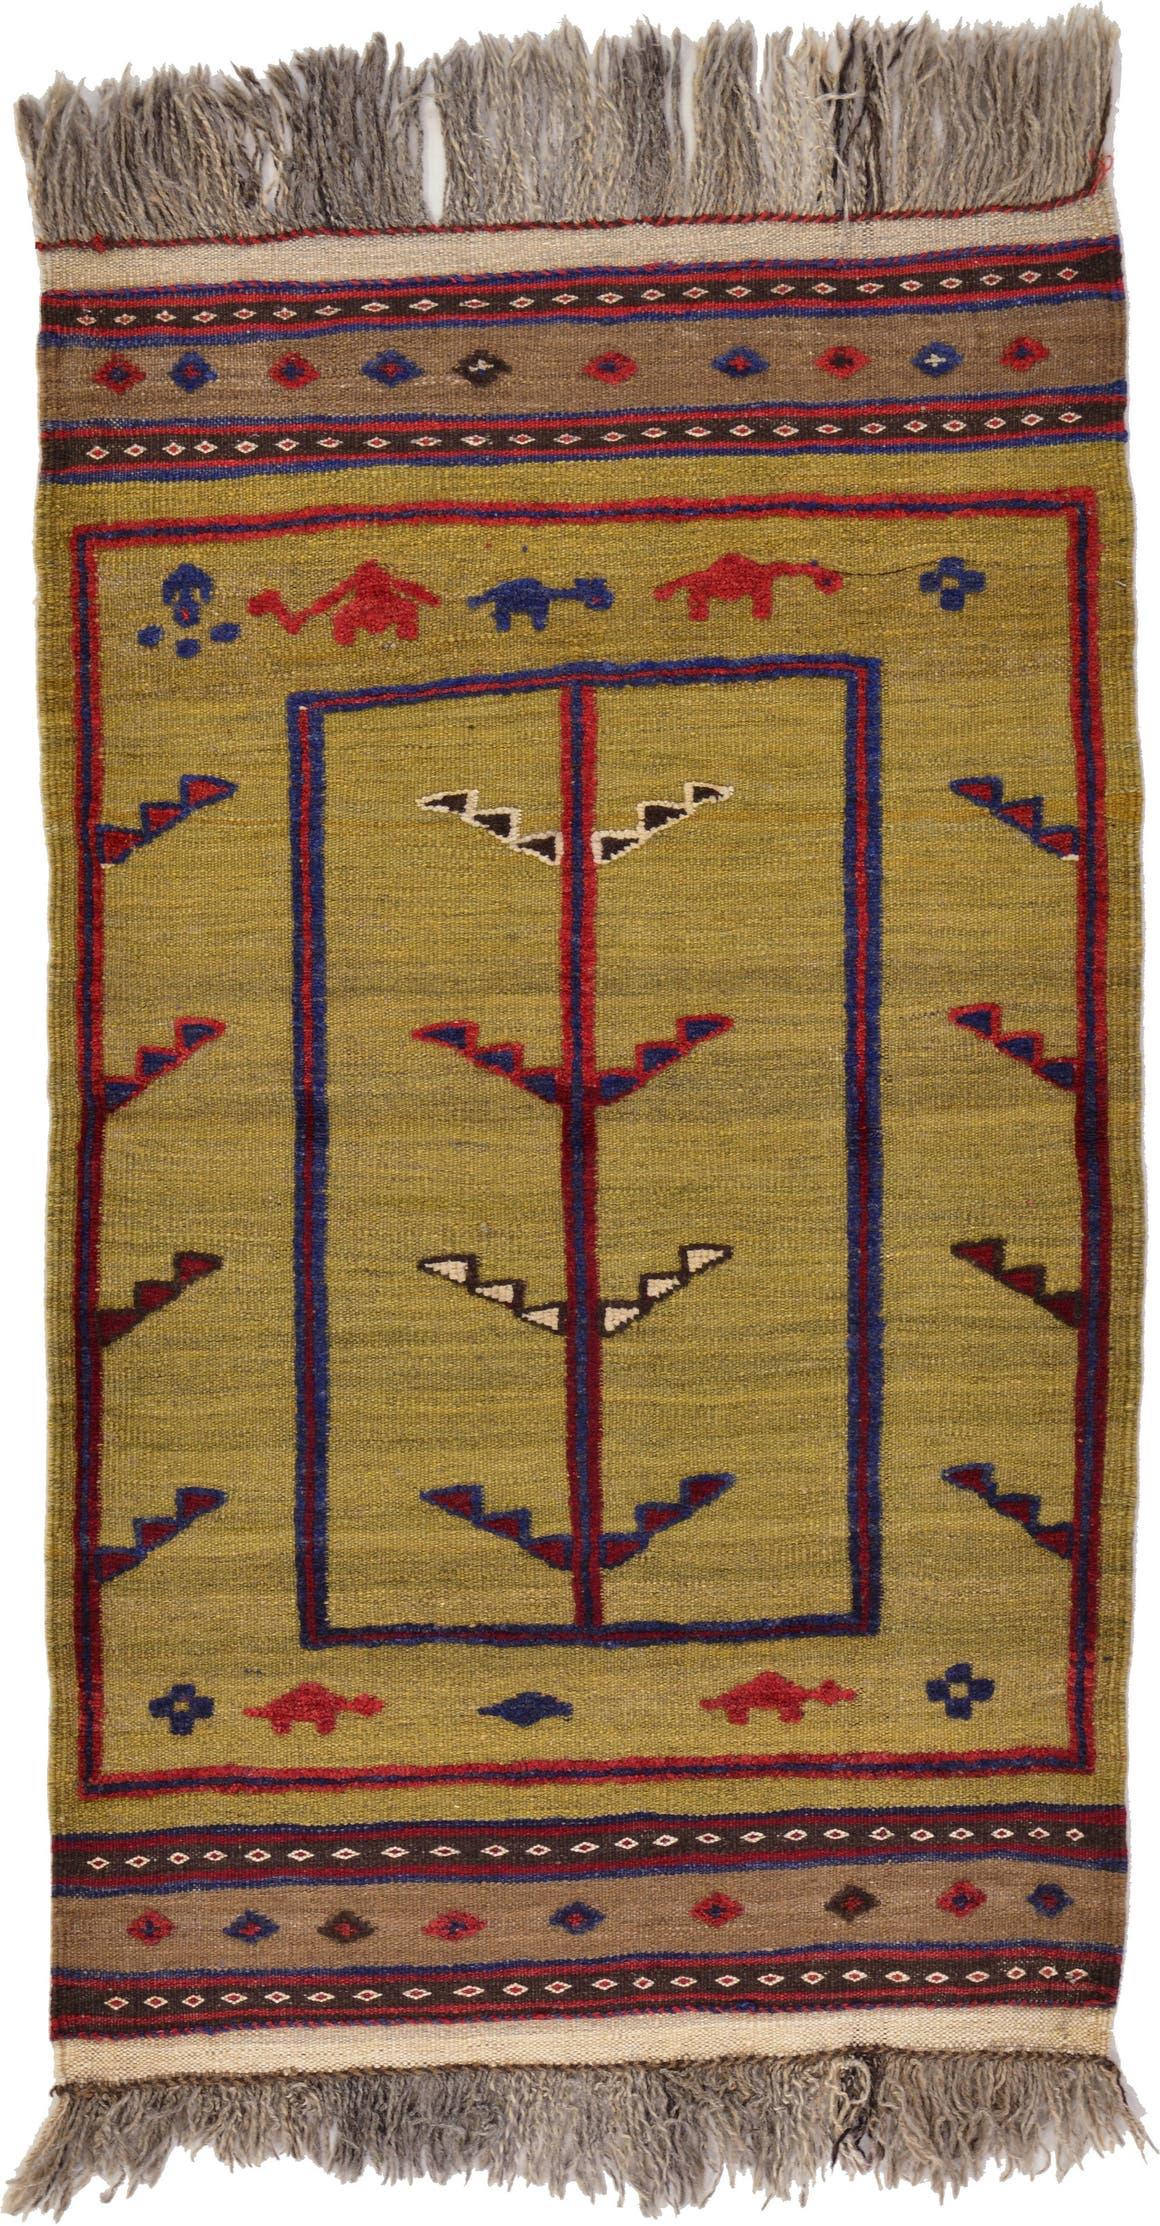 2' 7 x 4' 4 Kilim Afghan Rug main image